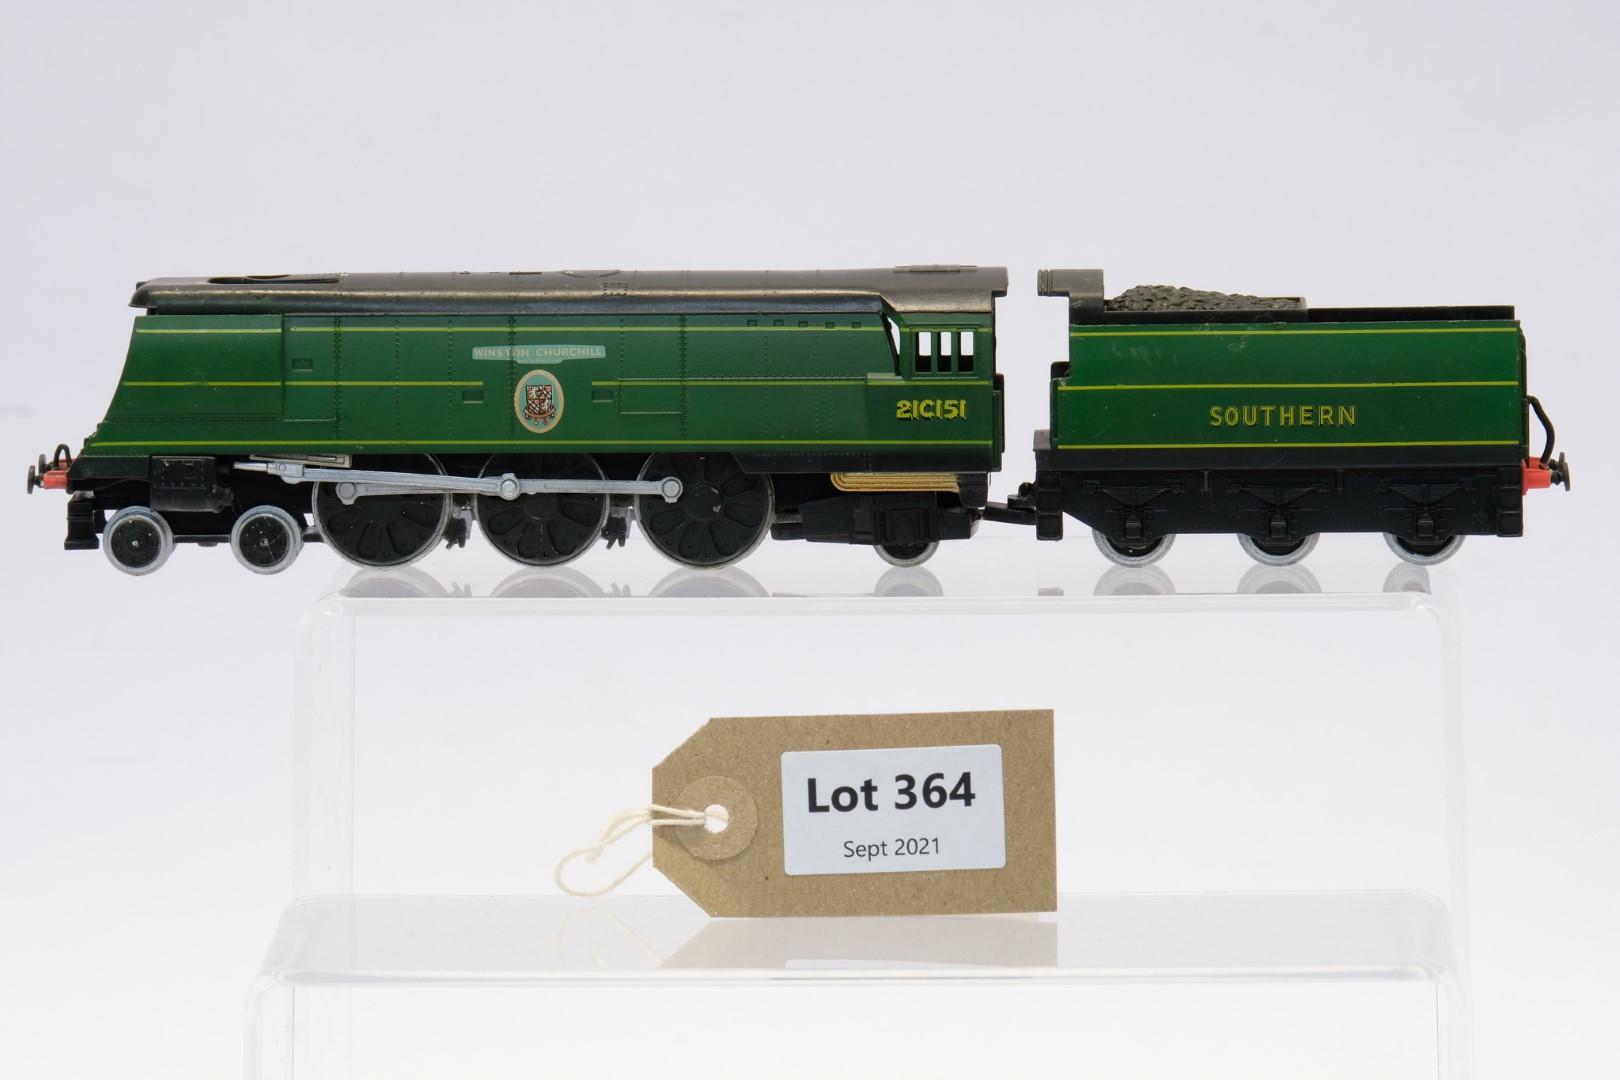 Winston Churchill Locomotive and Tender 21C151 - No Box - No Moving Parts